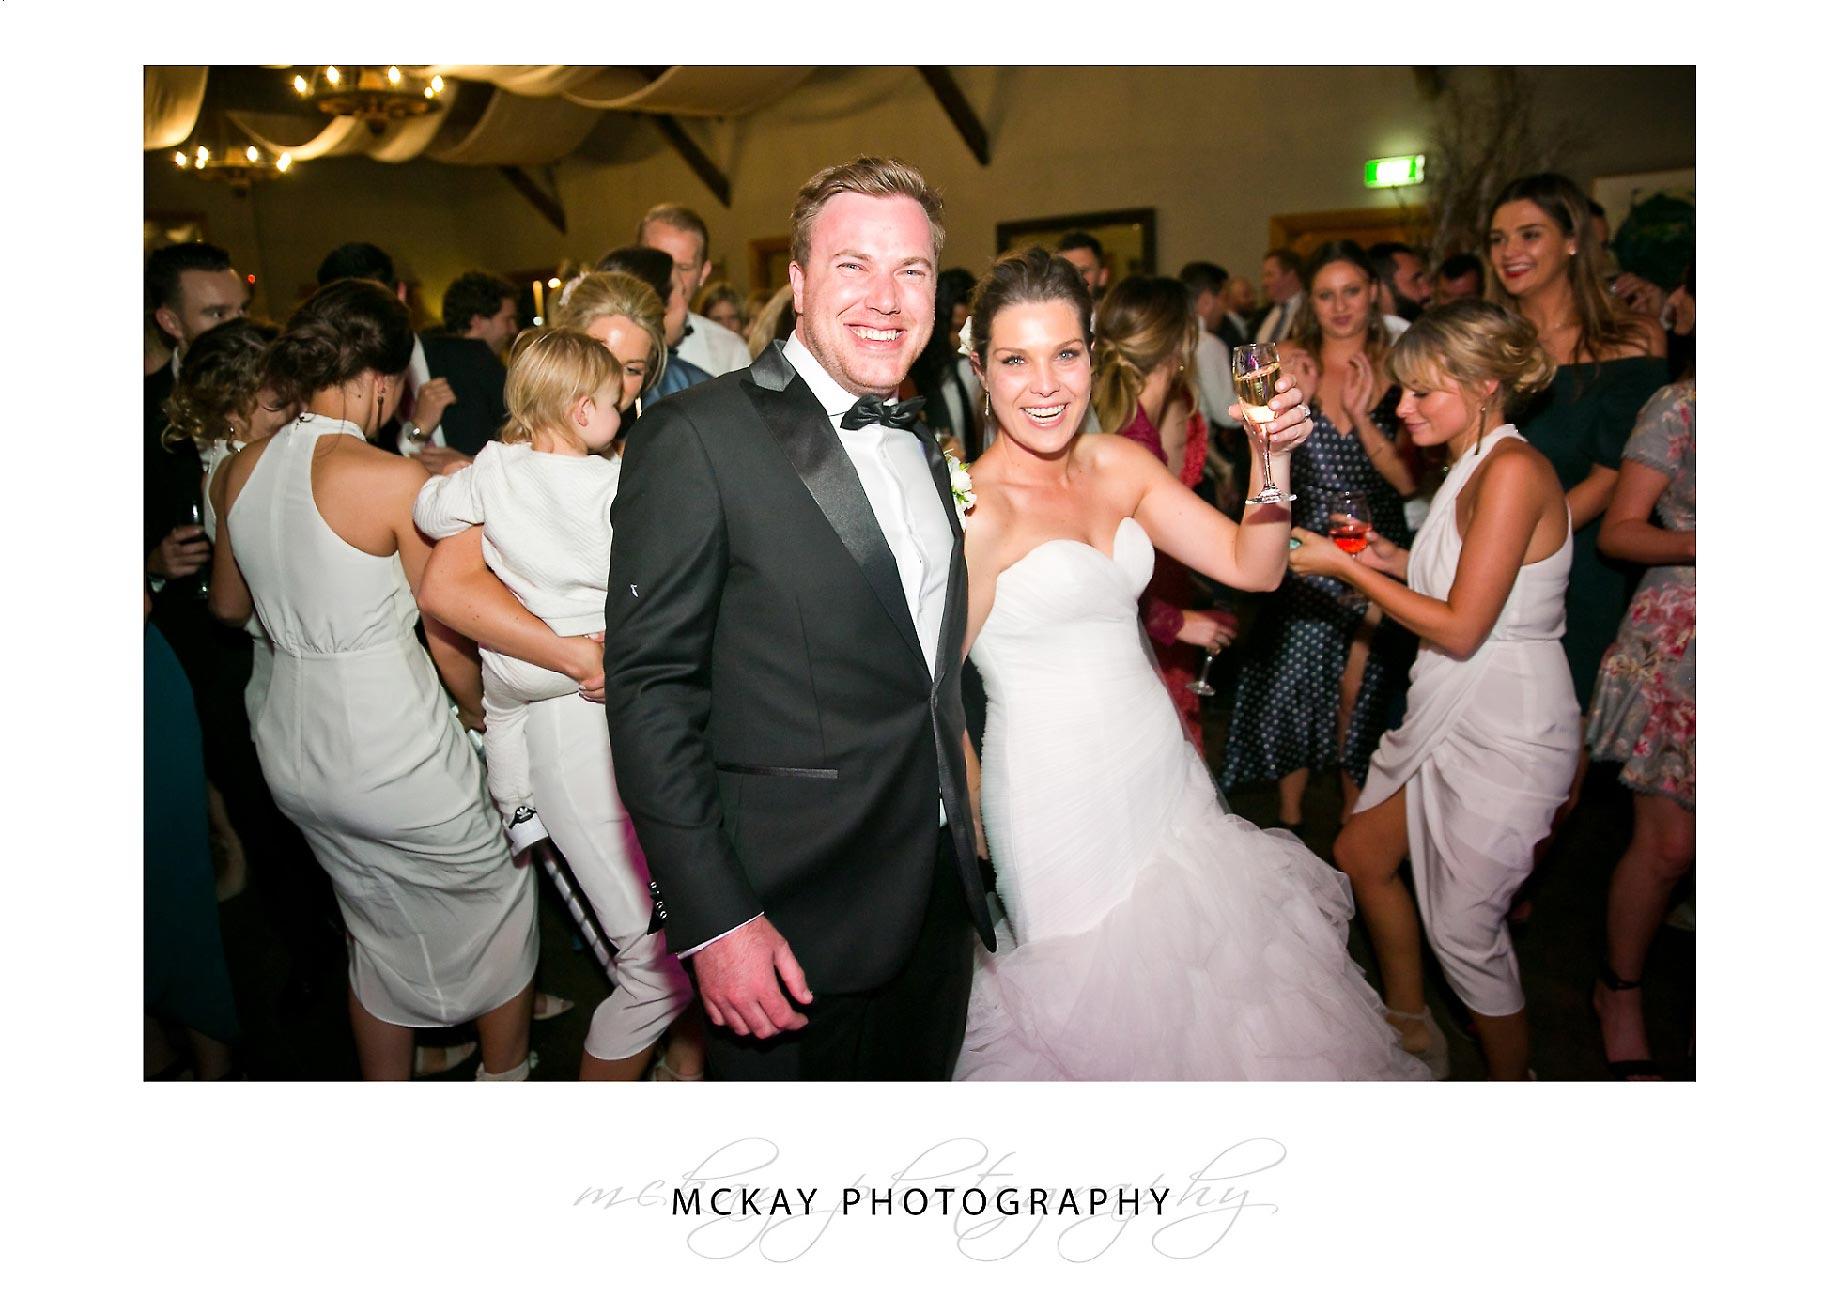 Jessie & Adam dance floor wedding photo